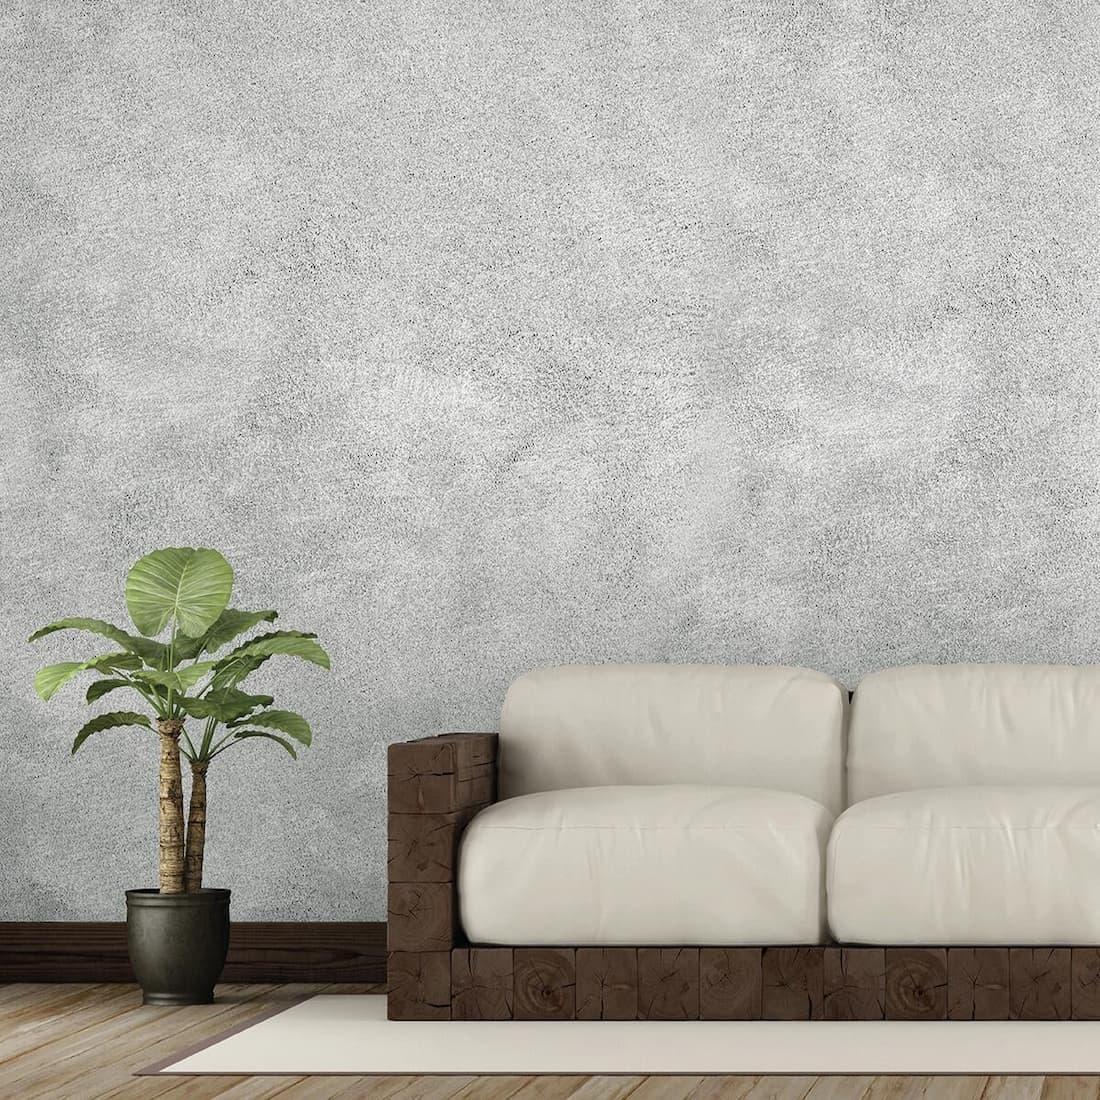 Pittura pareti effetto sabbia, Leroy merlin, linea GECKOS Sabbia